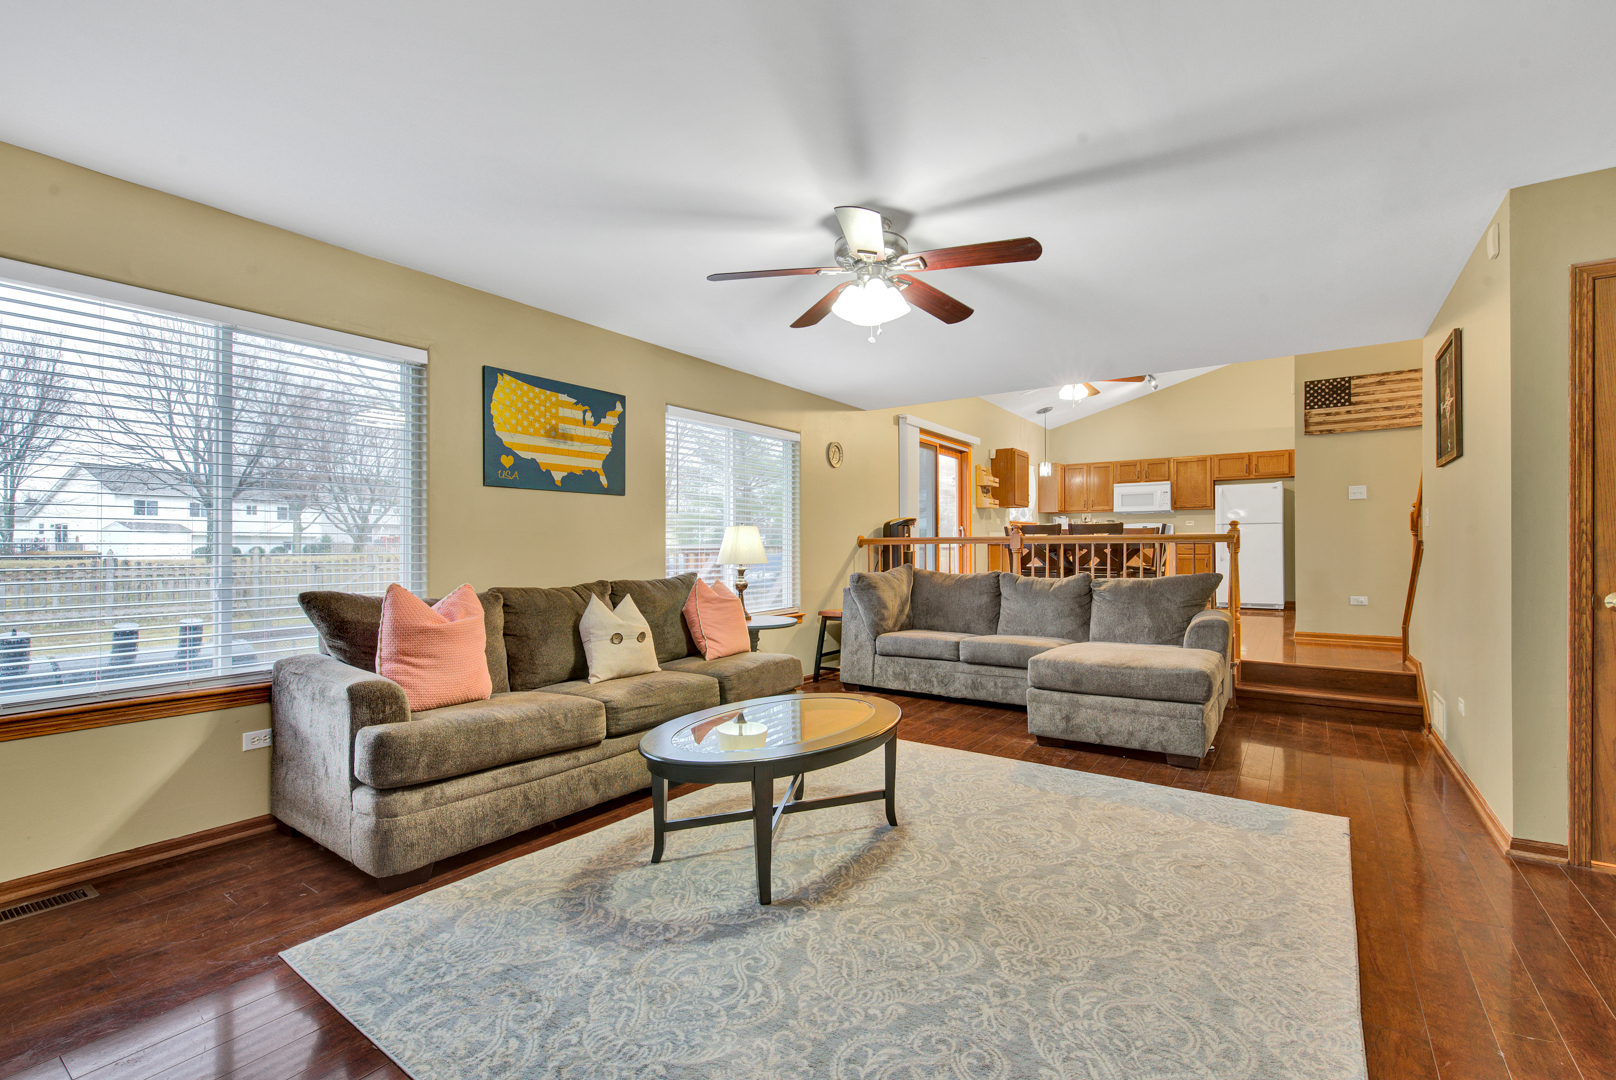 25301 West Brookfield, Channahon, Illinois, 60410